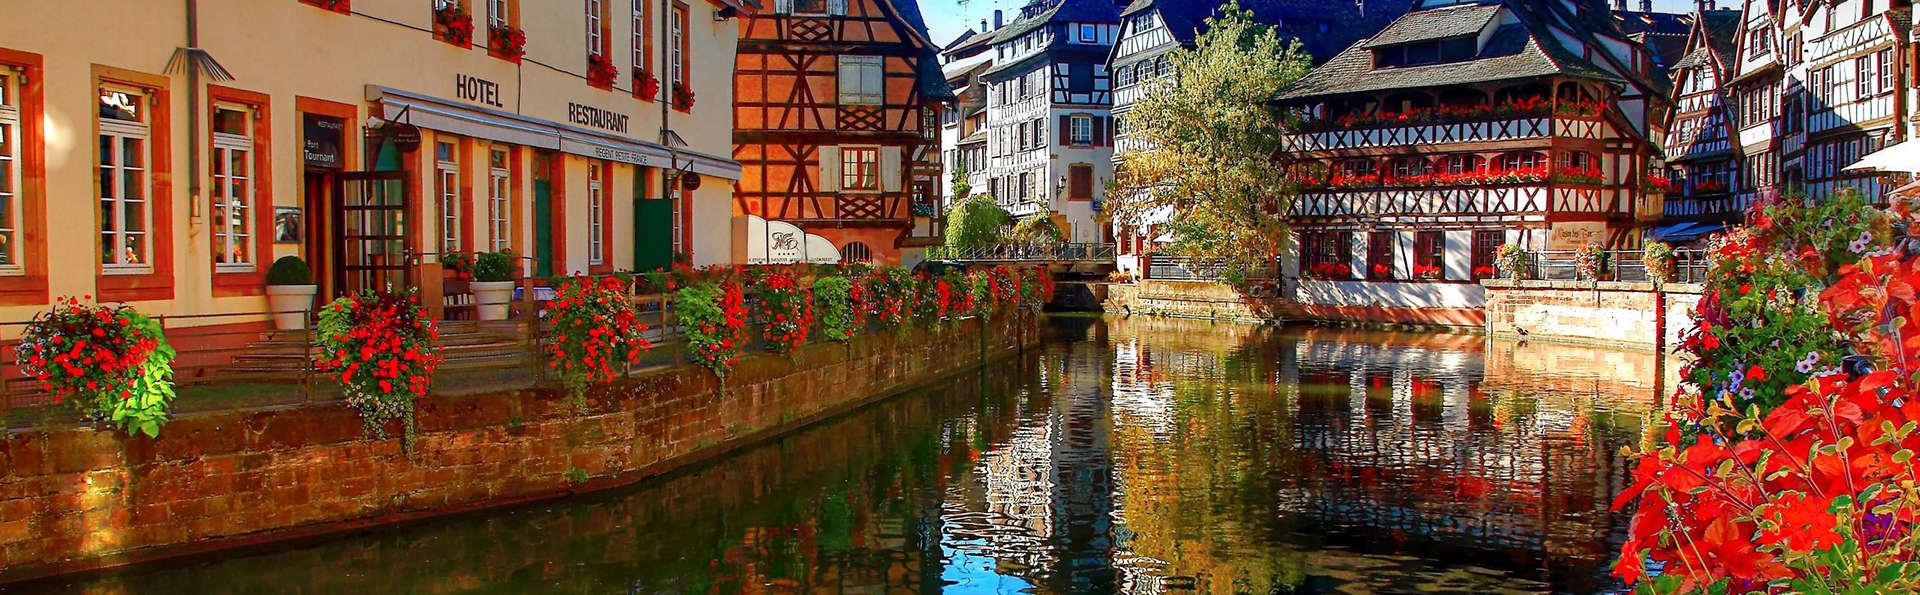 Mercure Strasbourg Centre - Edit_Strasbourg2.jpg